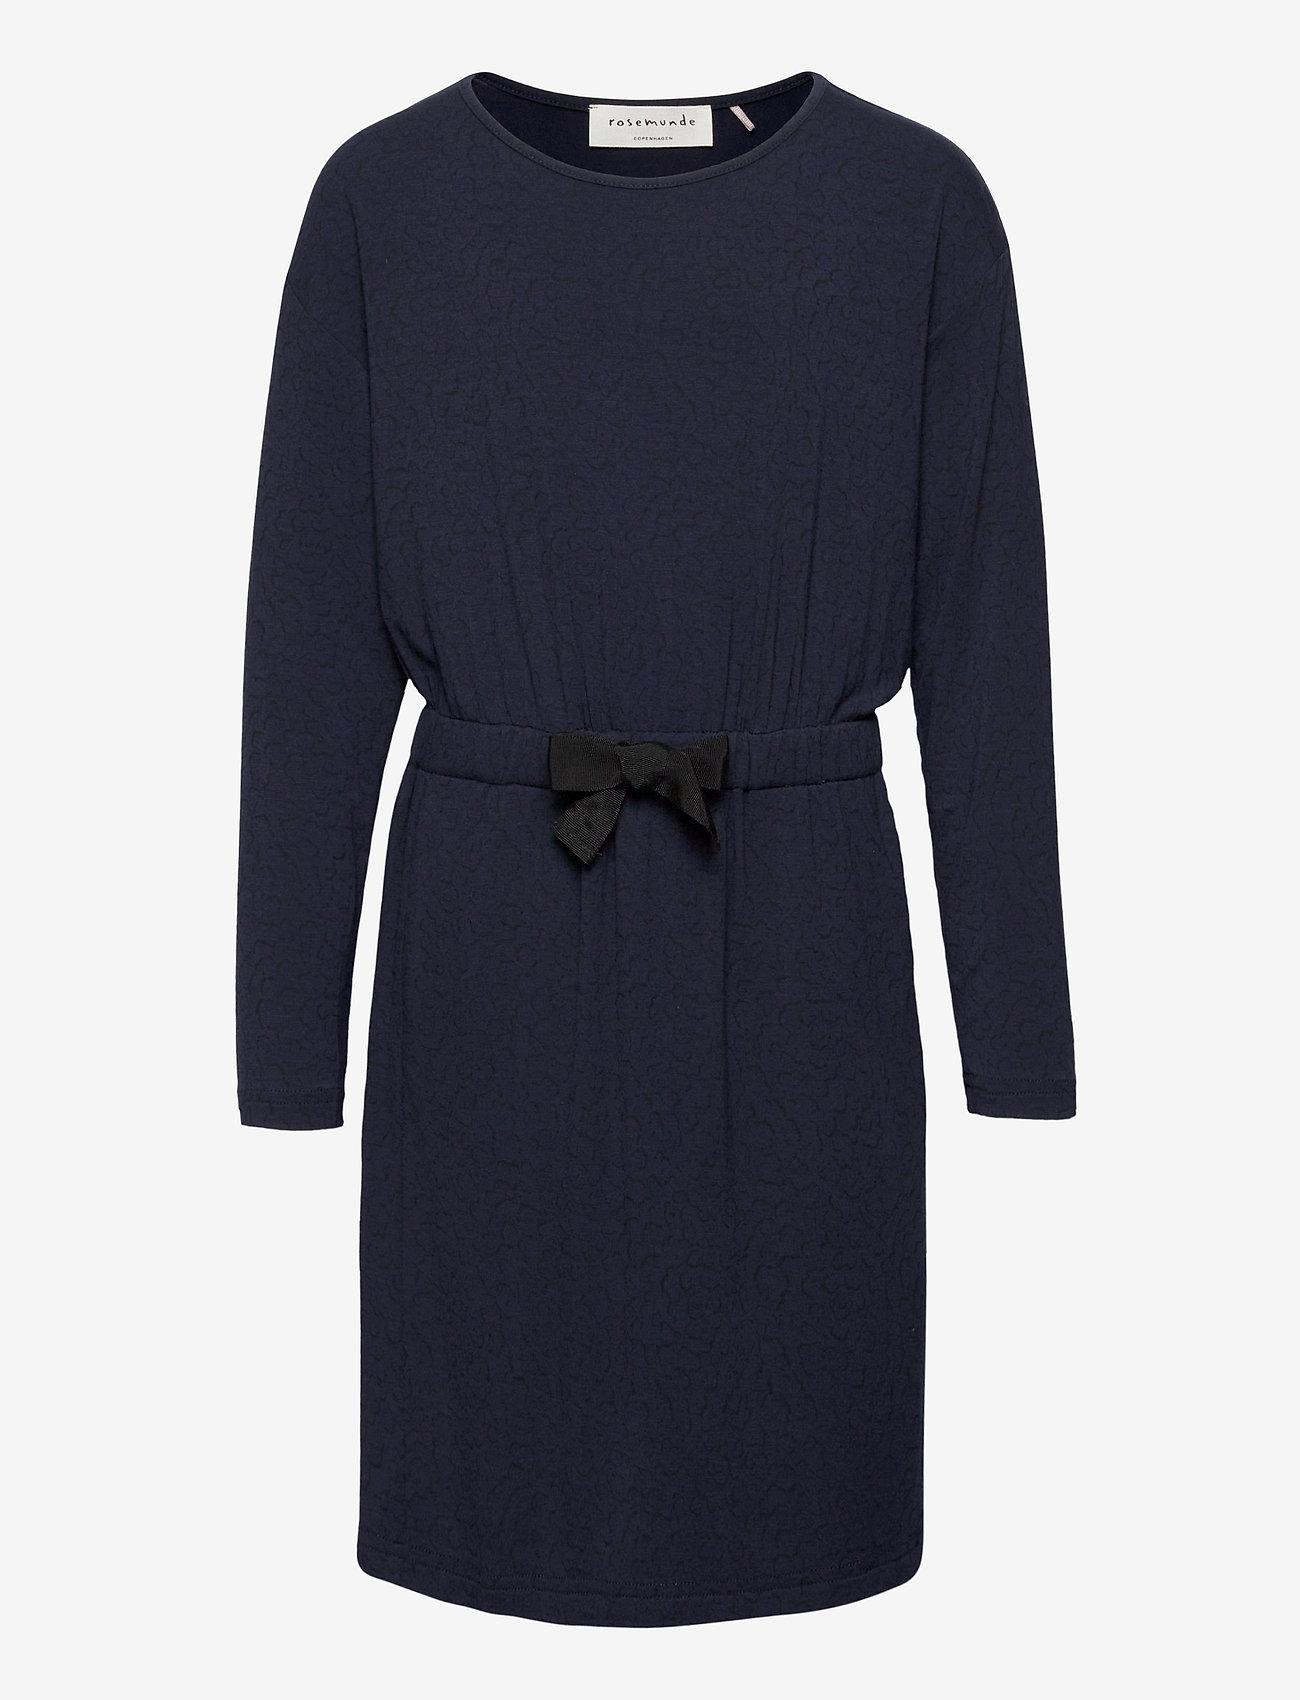 Rosemunde Kids - Dress ls - robes - blue whirlwind print - 0